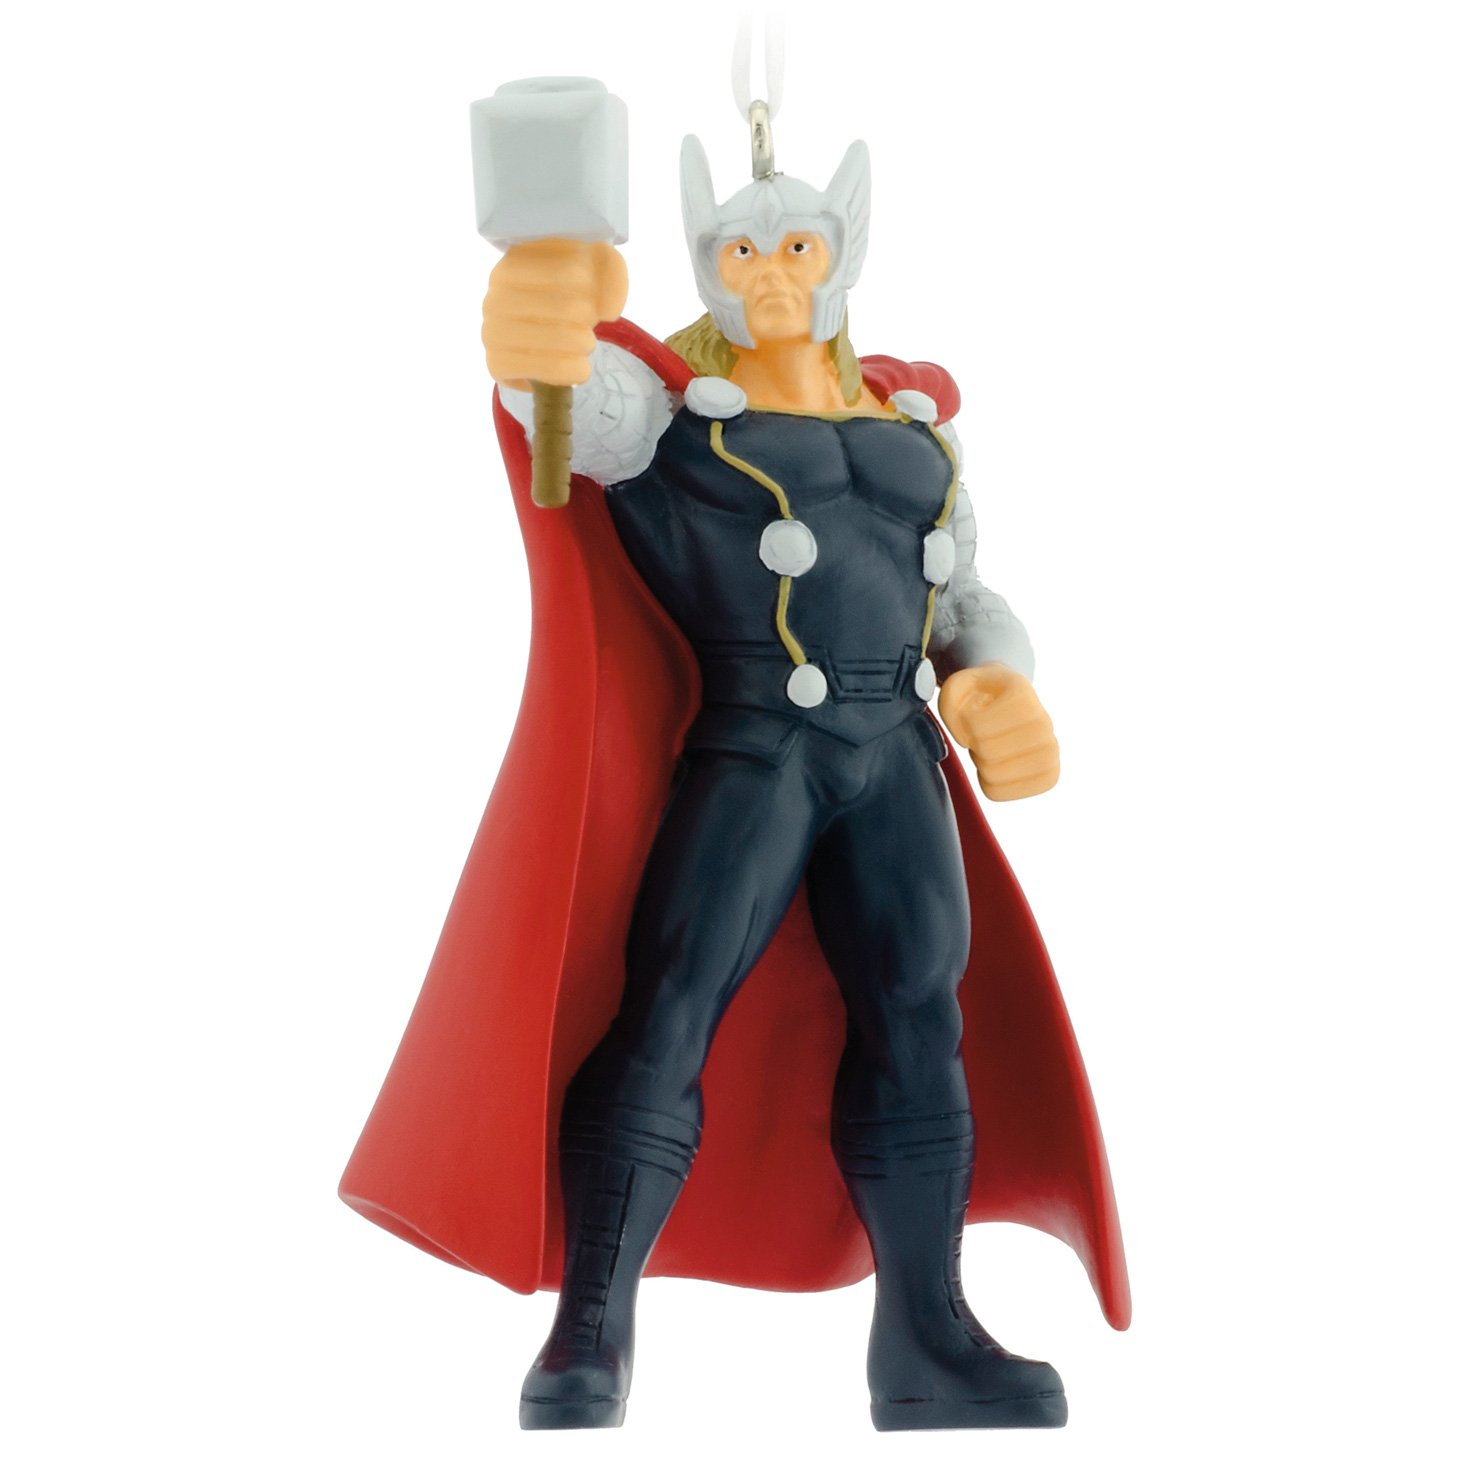 Amazon.com: Hallmark Avengers Thor Christmas Ornament: Home & Kitchen